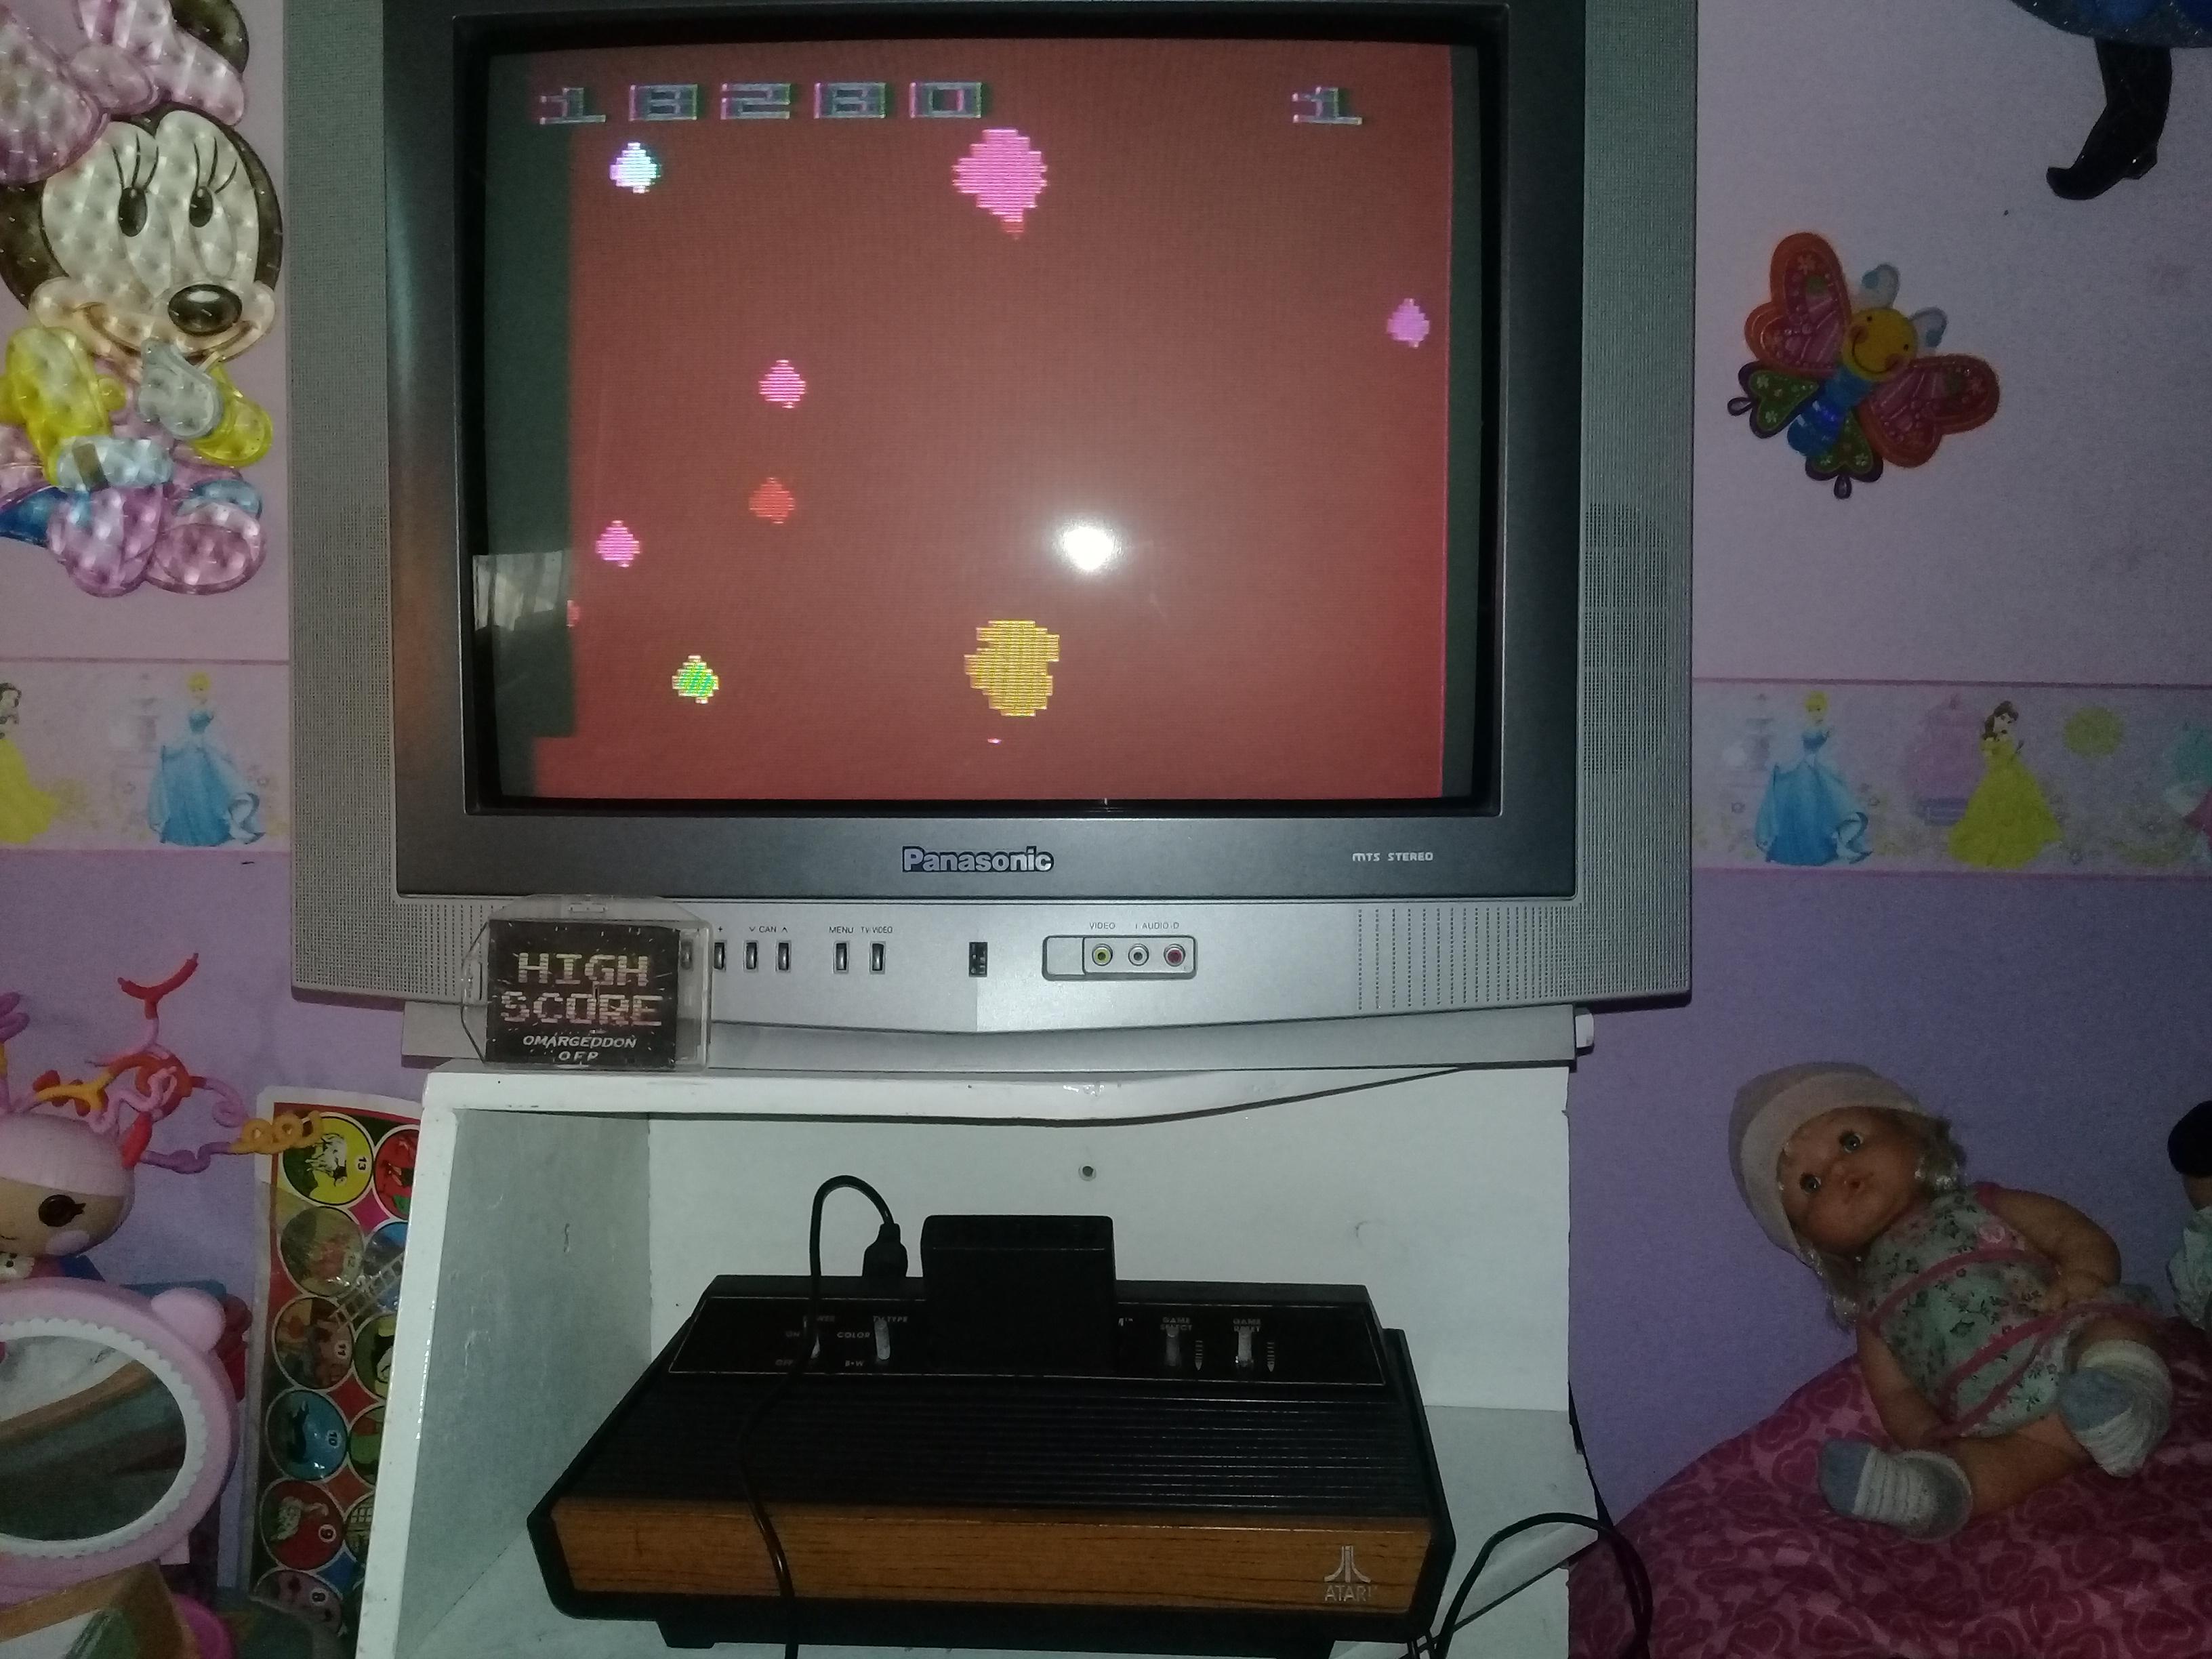 omargeddon: Asteroids: Game 16 (Atari 2600 Expert/A) 18,280 points on 2019-06-23 17:35:46